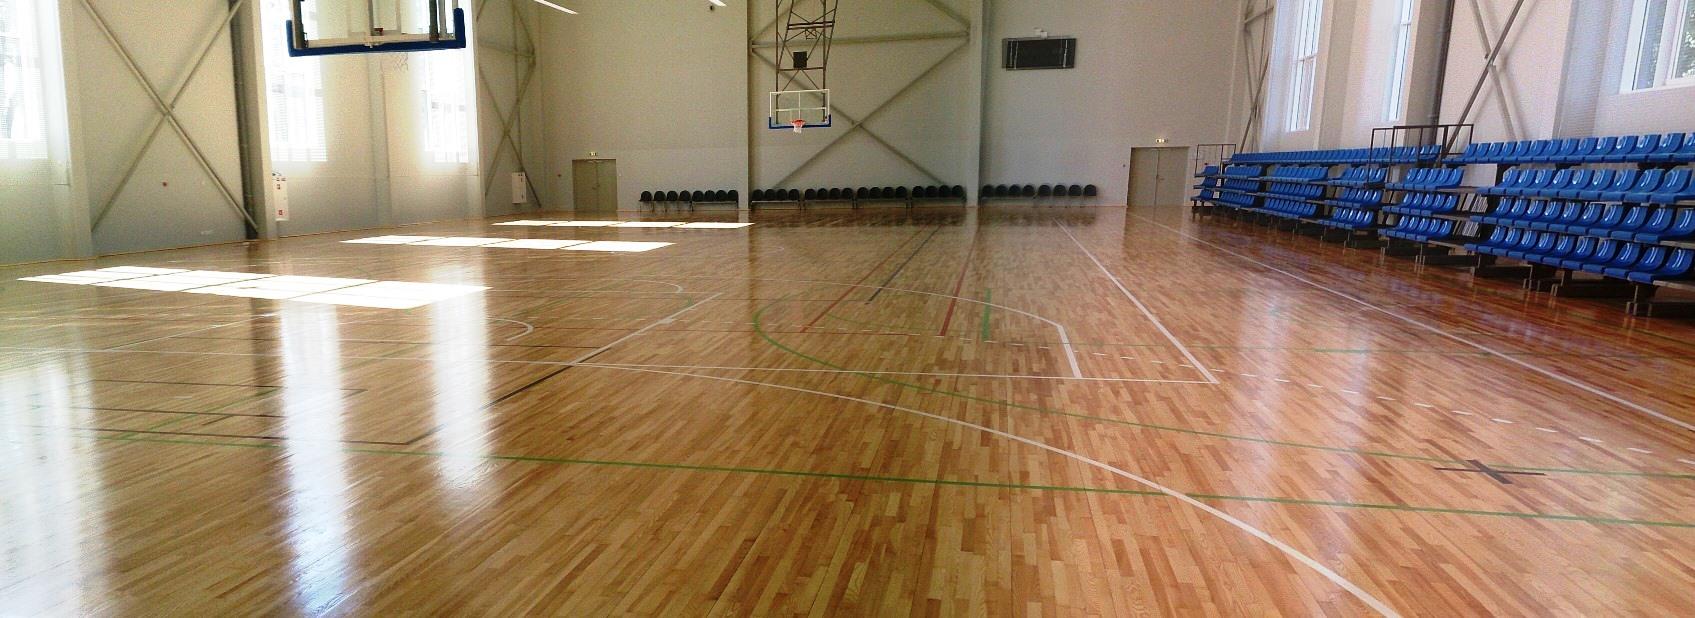 O.Kalpaka Rīgas Tautas daiļamatu pamatskolas sporta zāle